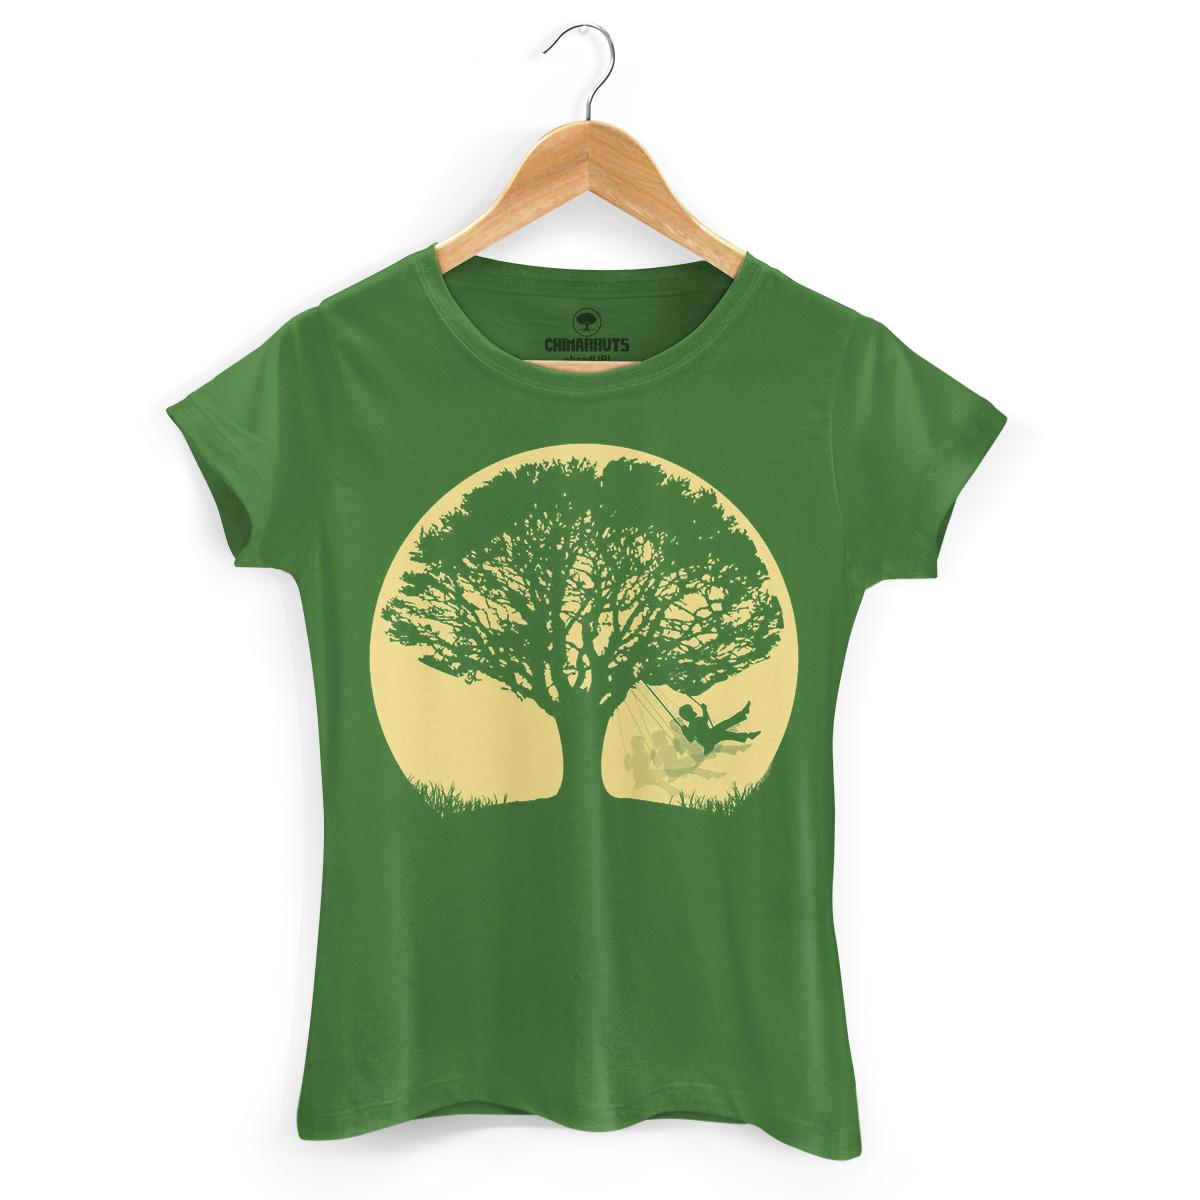 Camiseta Feminina Chimarruts Sinto a Liberdade